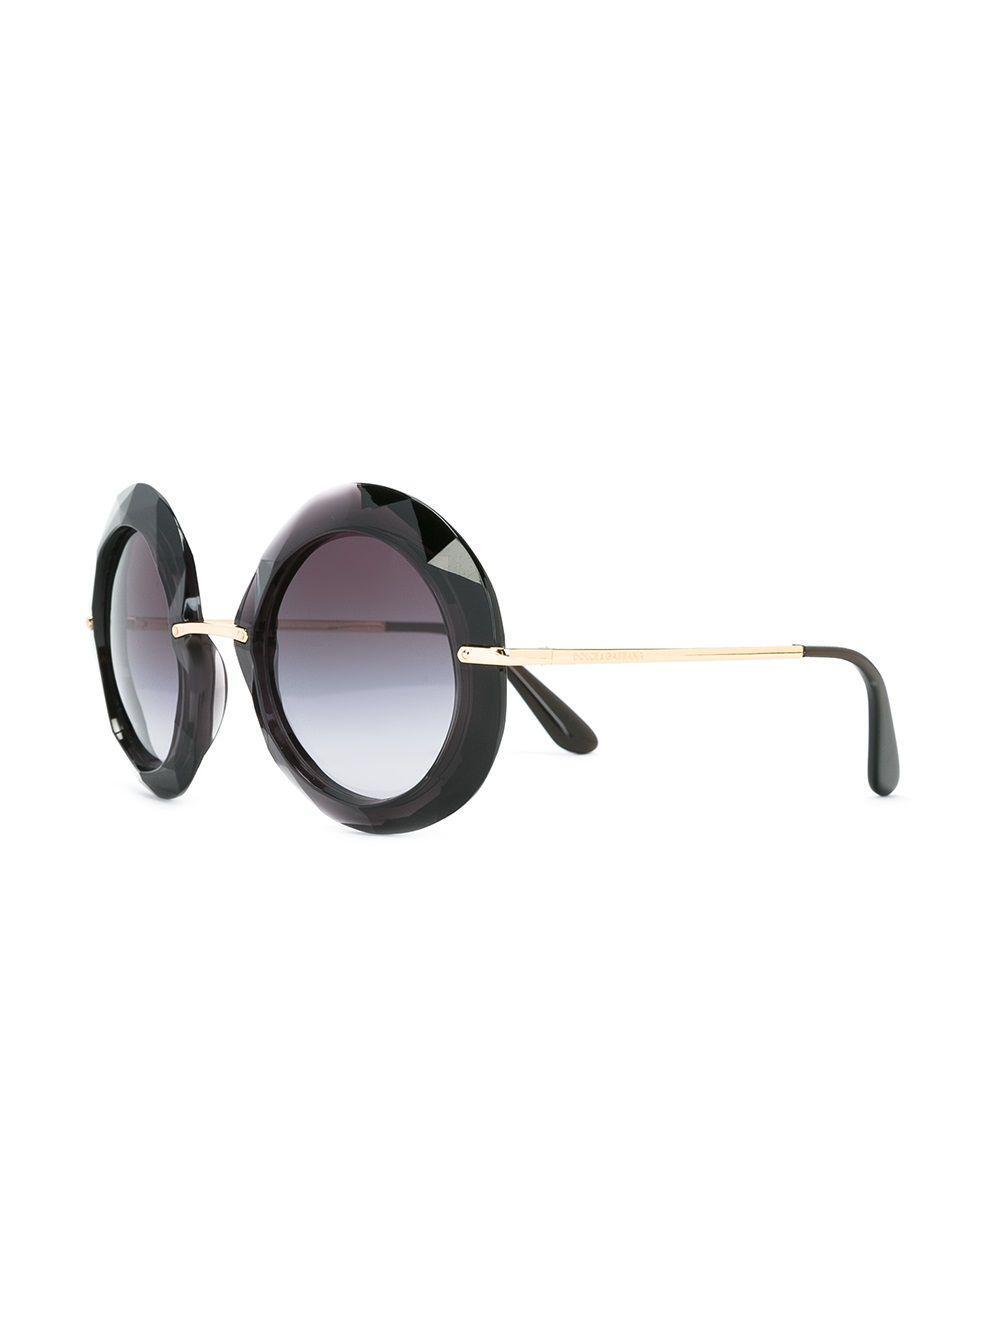 Dolce & Gabbana Oversized Sunglasses in Black